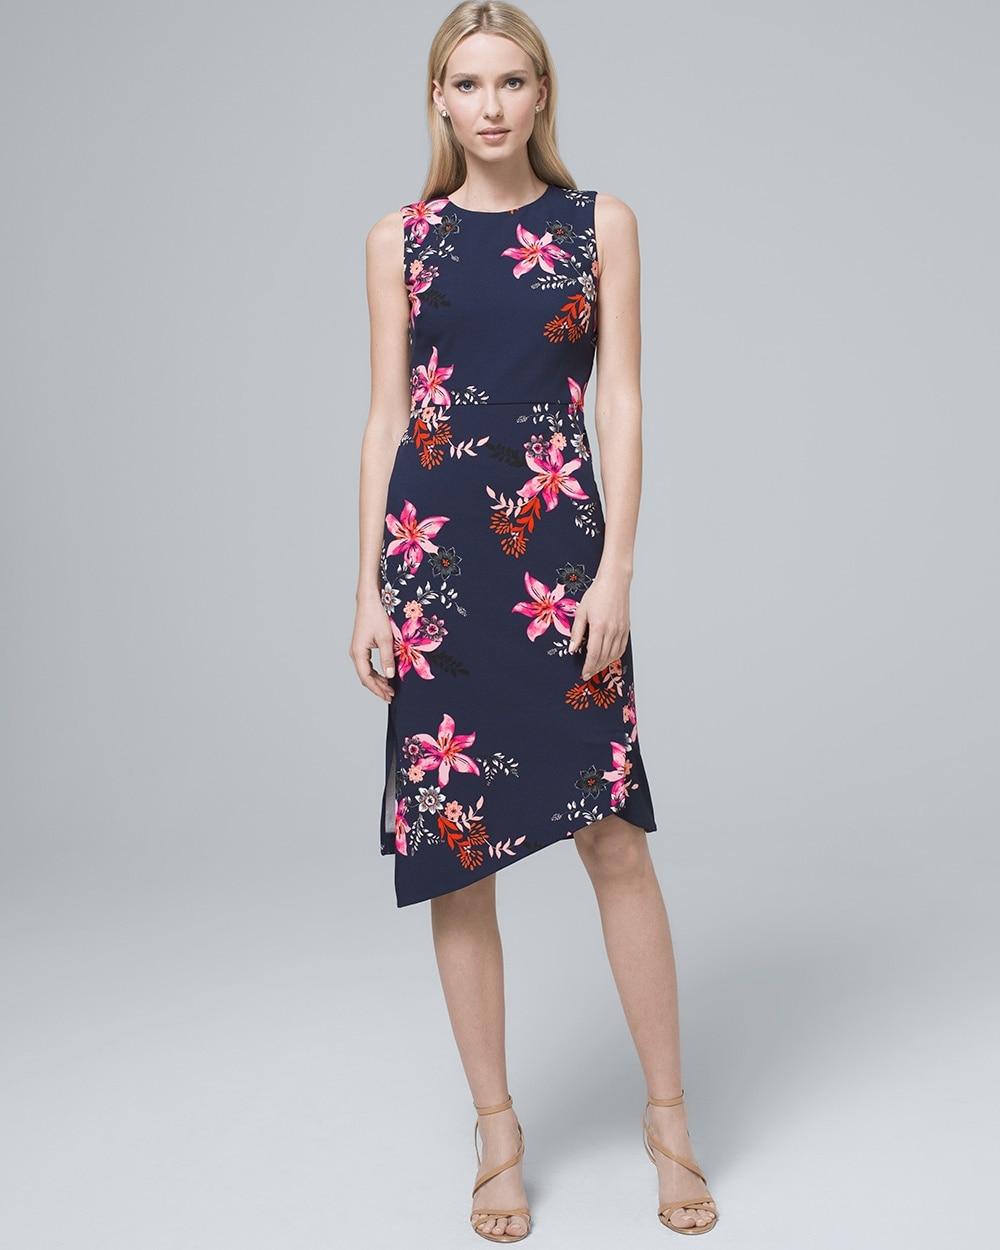 e110669a8d6 Return to thumbnail image selection Asymmetric-Hem Floral Sheath Dress  video preview image